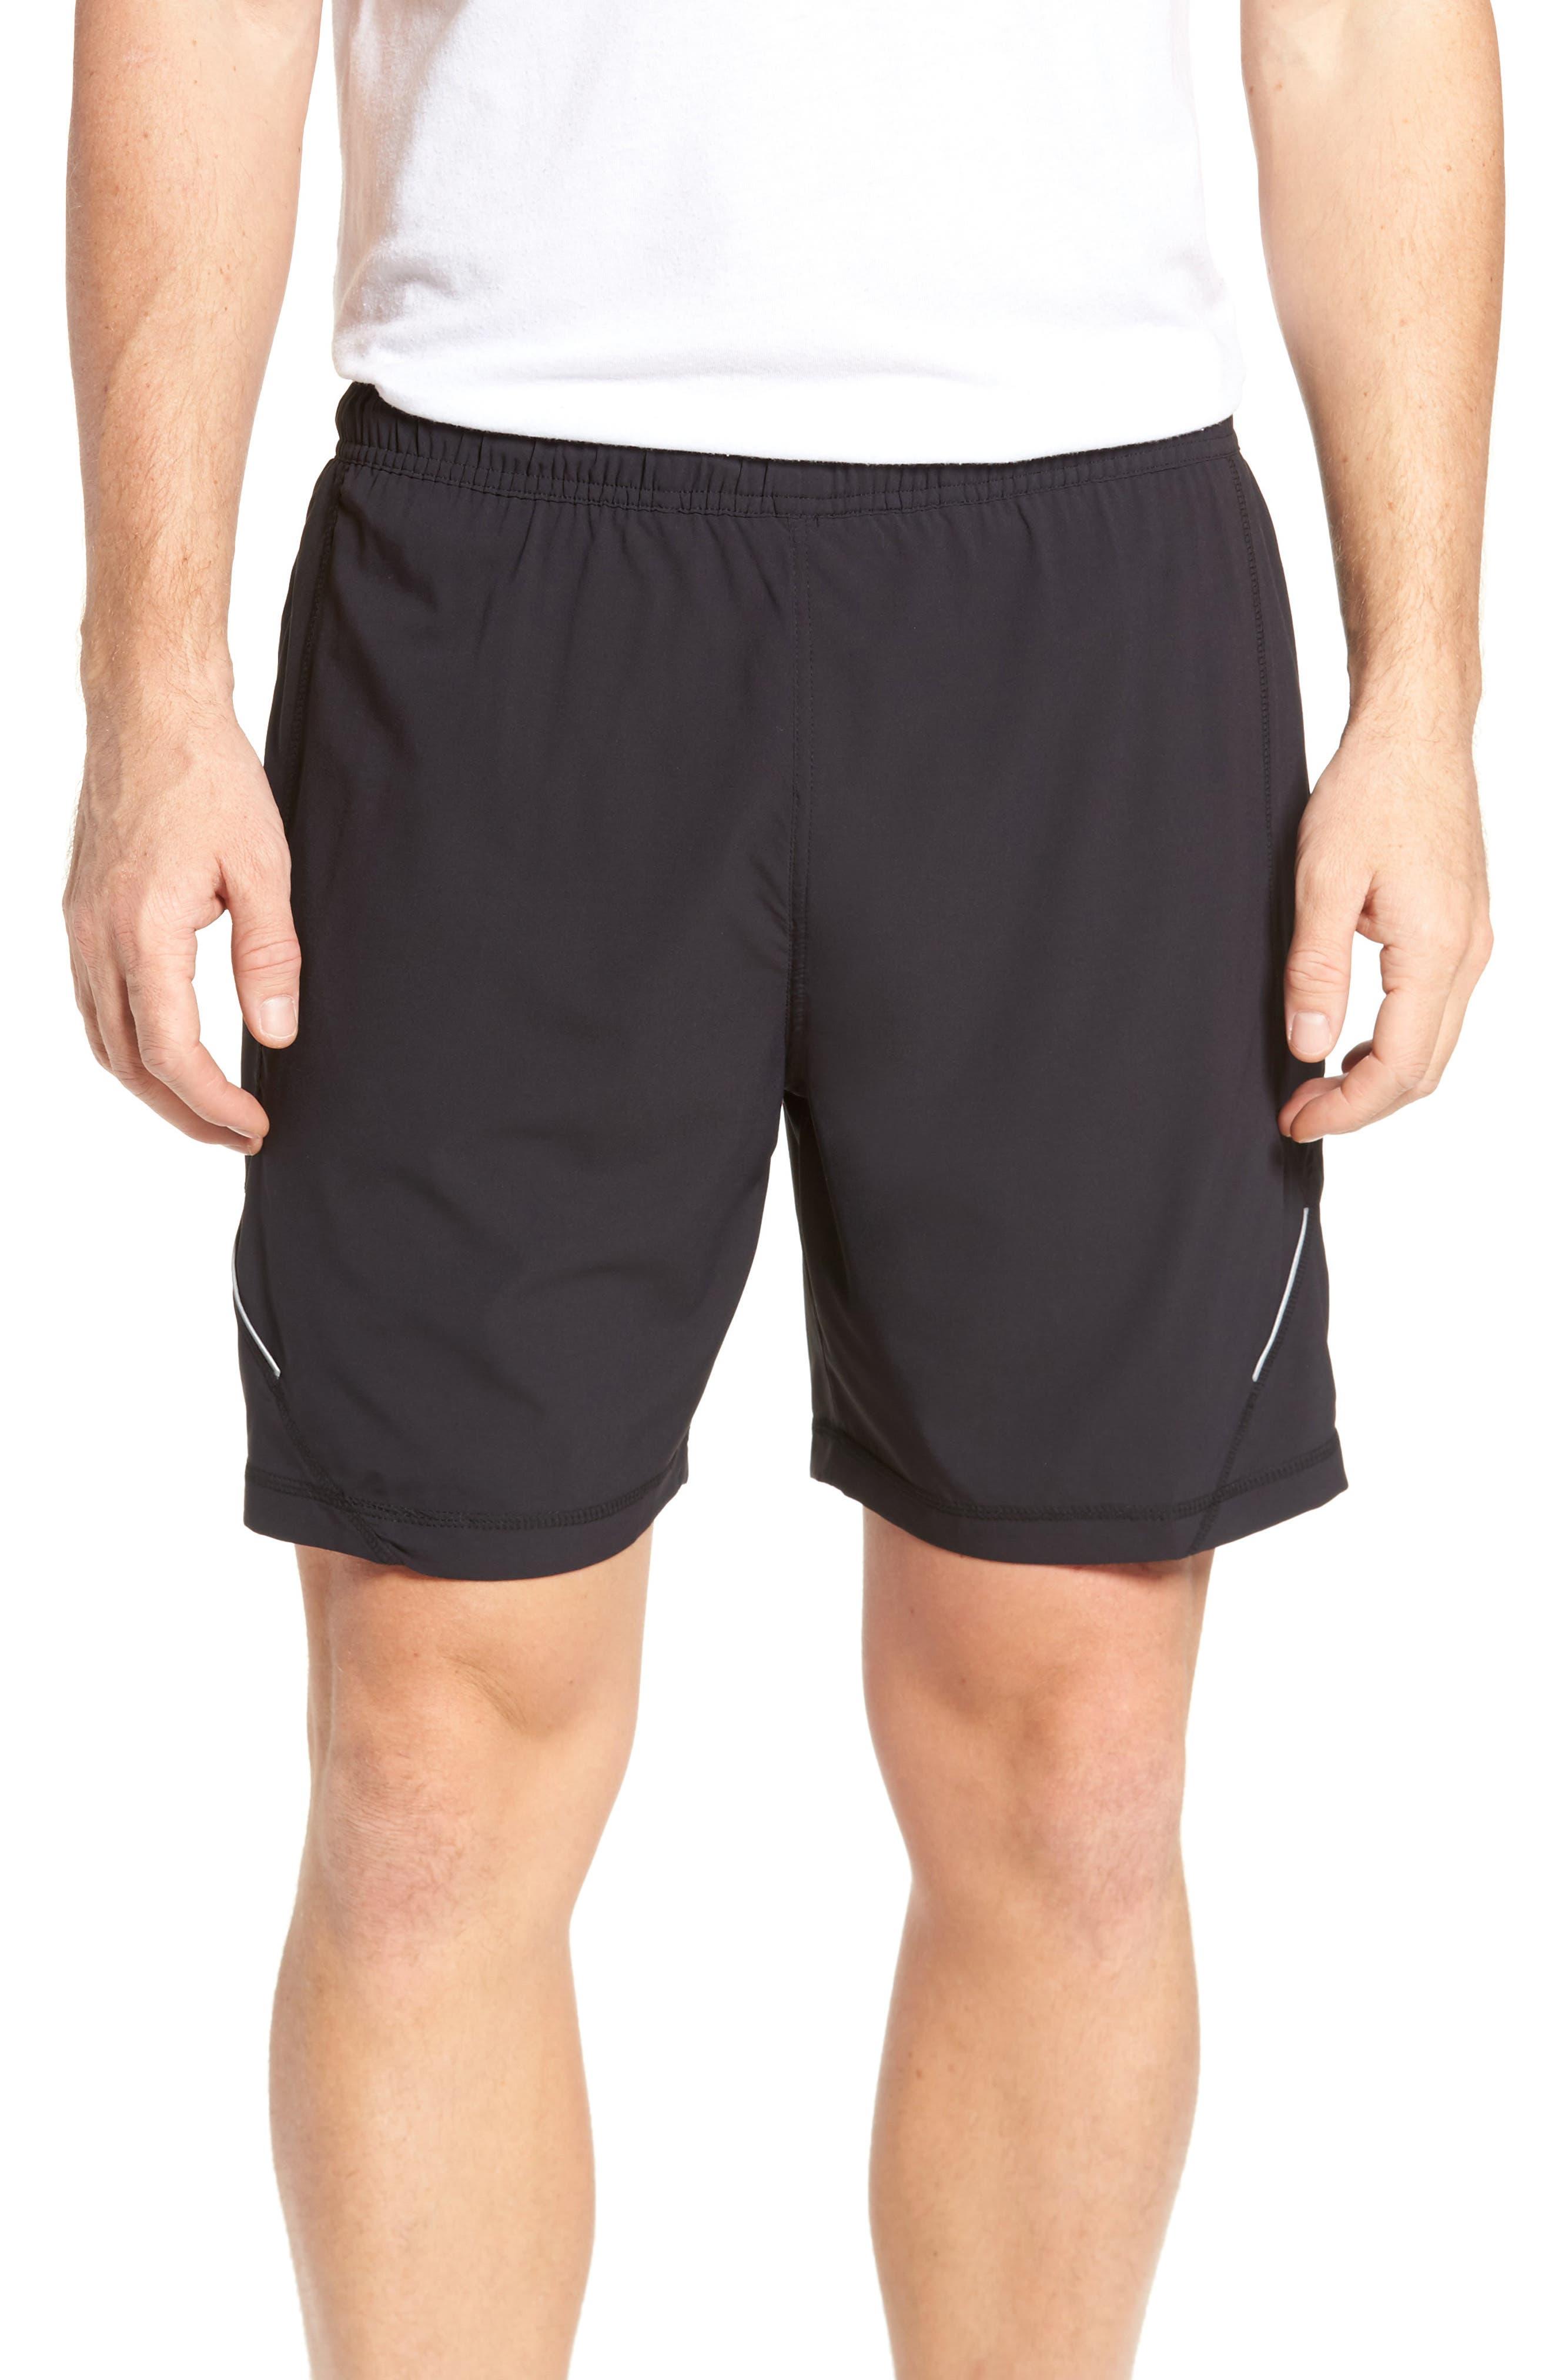 Men's Tasc Performance Clothing: Shop Men's Tasc Performance Clothes |  Nordstrom